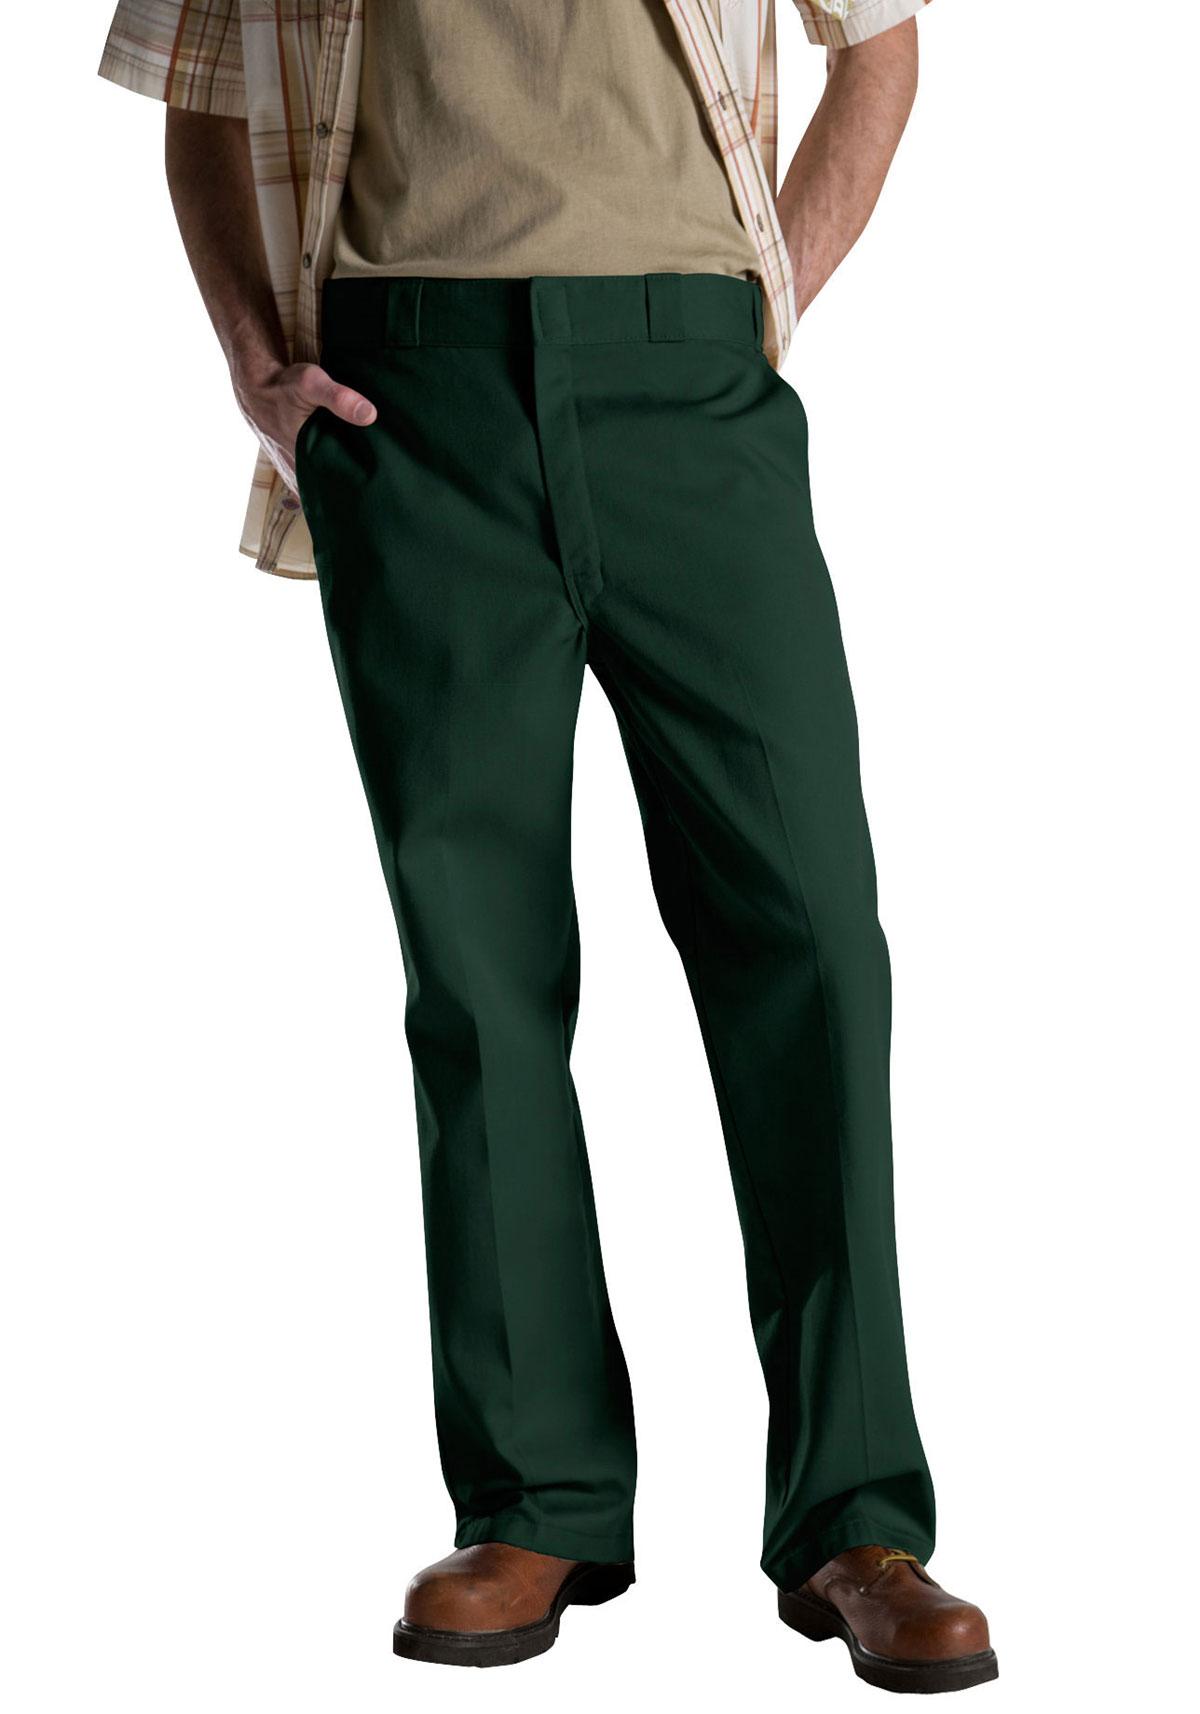 Hunter Green Work Pants